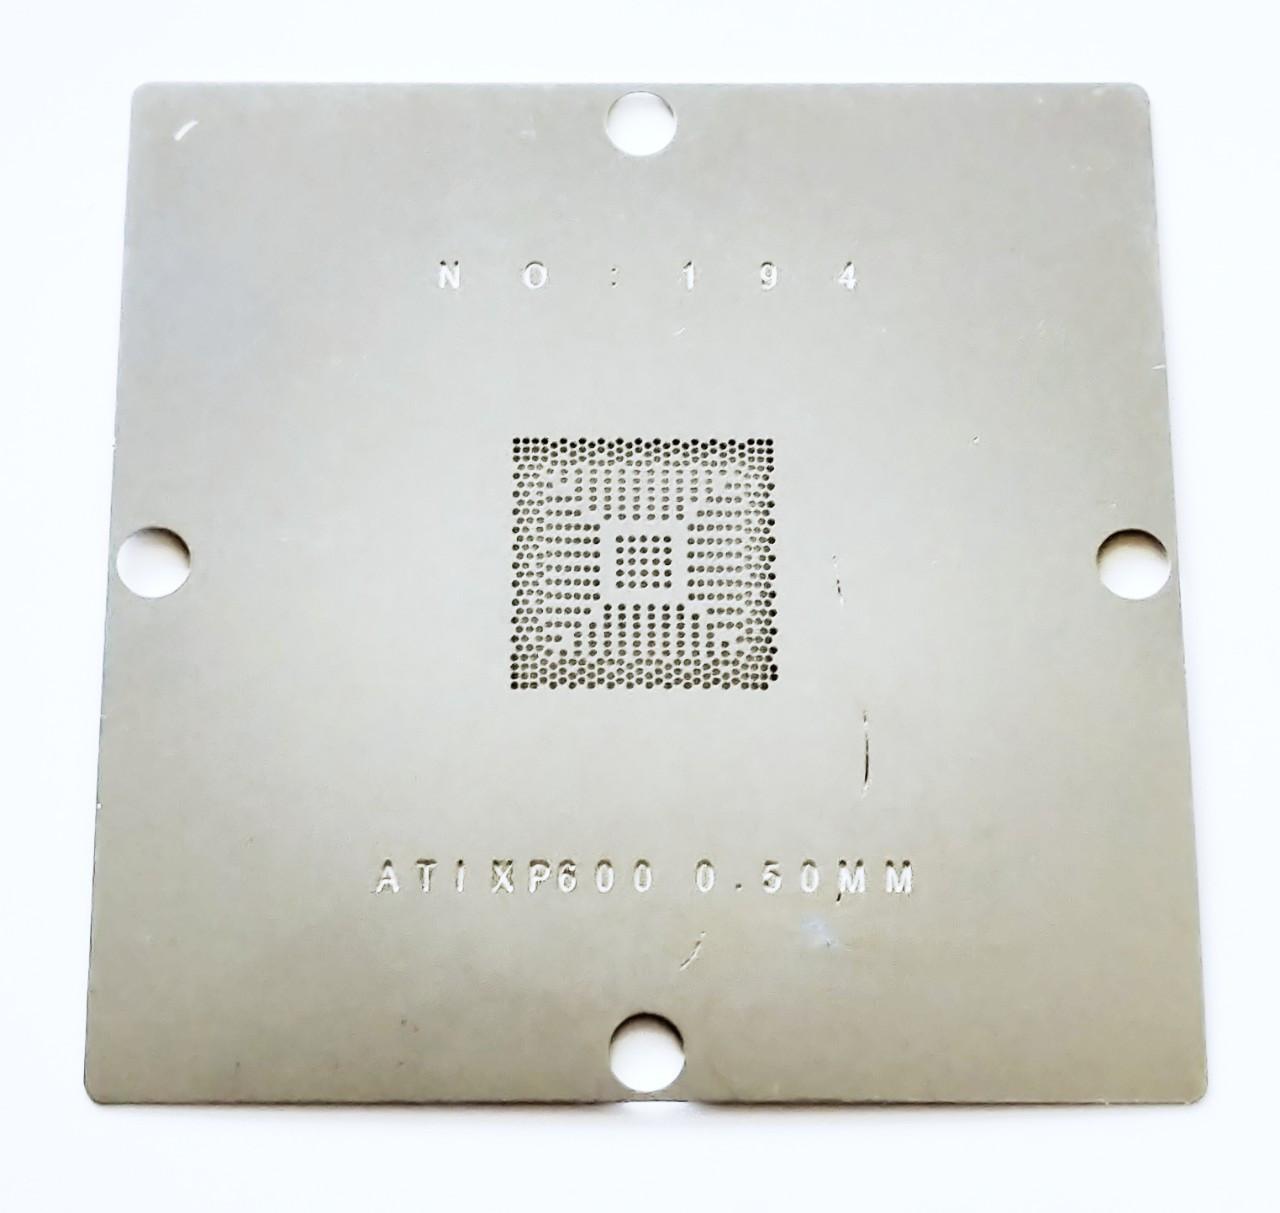 Трафарет BGA ATI IXP600, SB600, XP600. Шар 0,5 мм